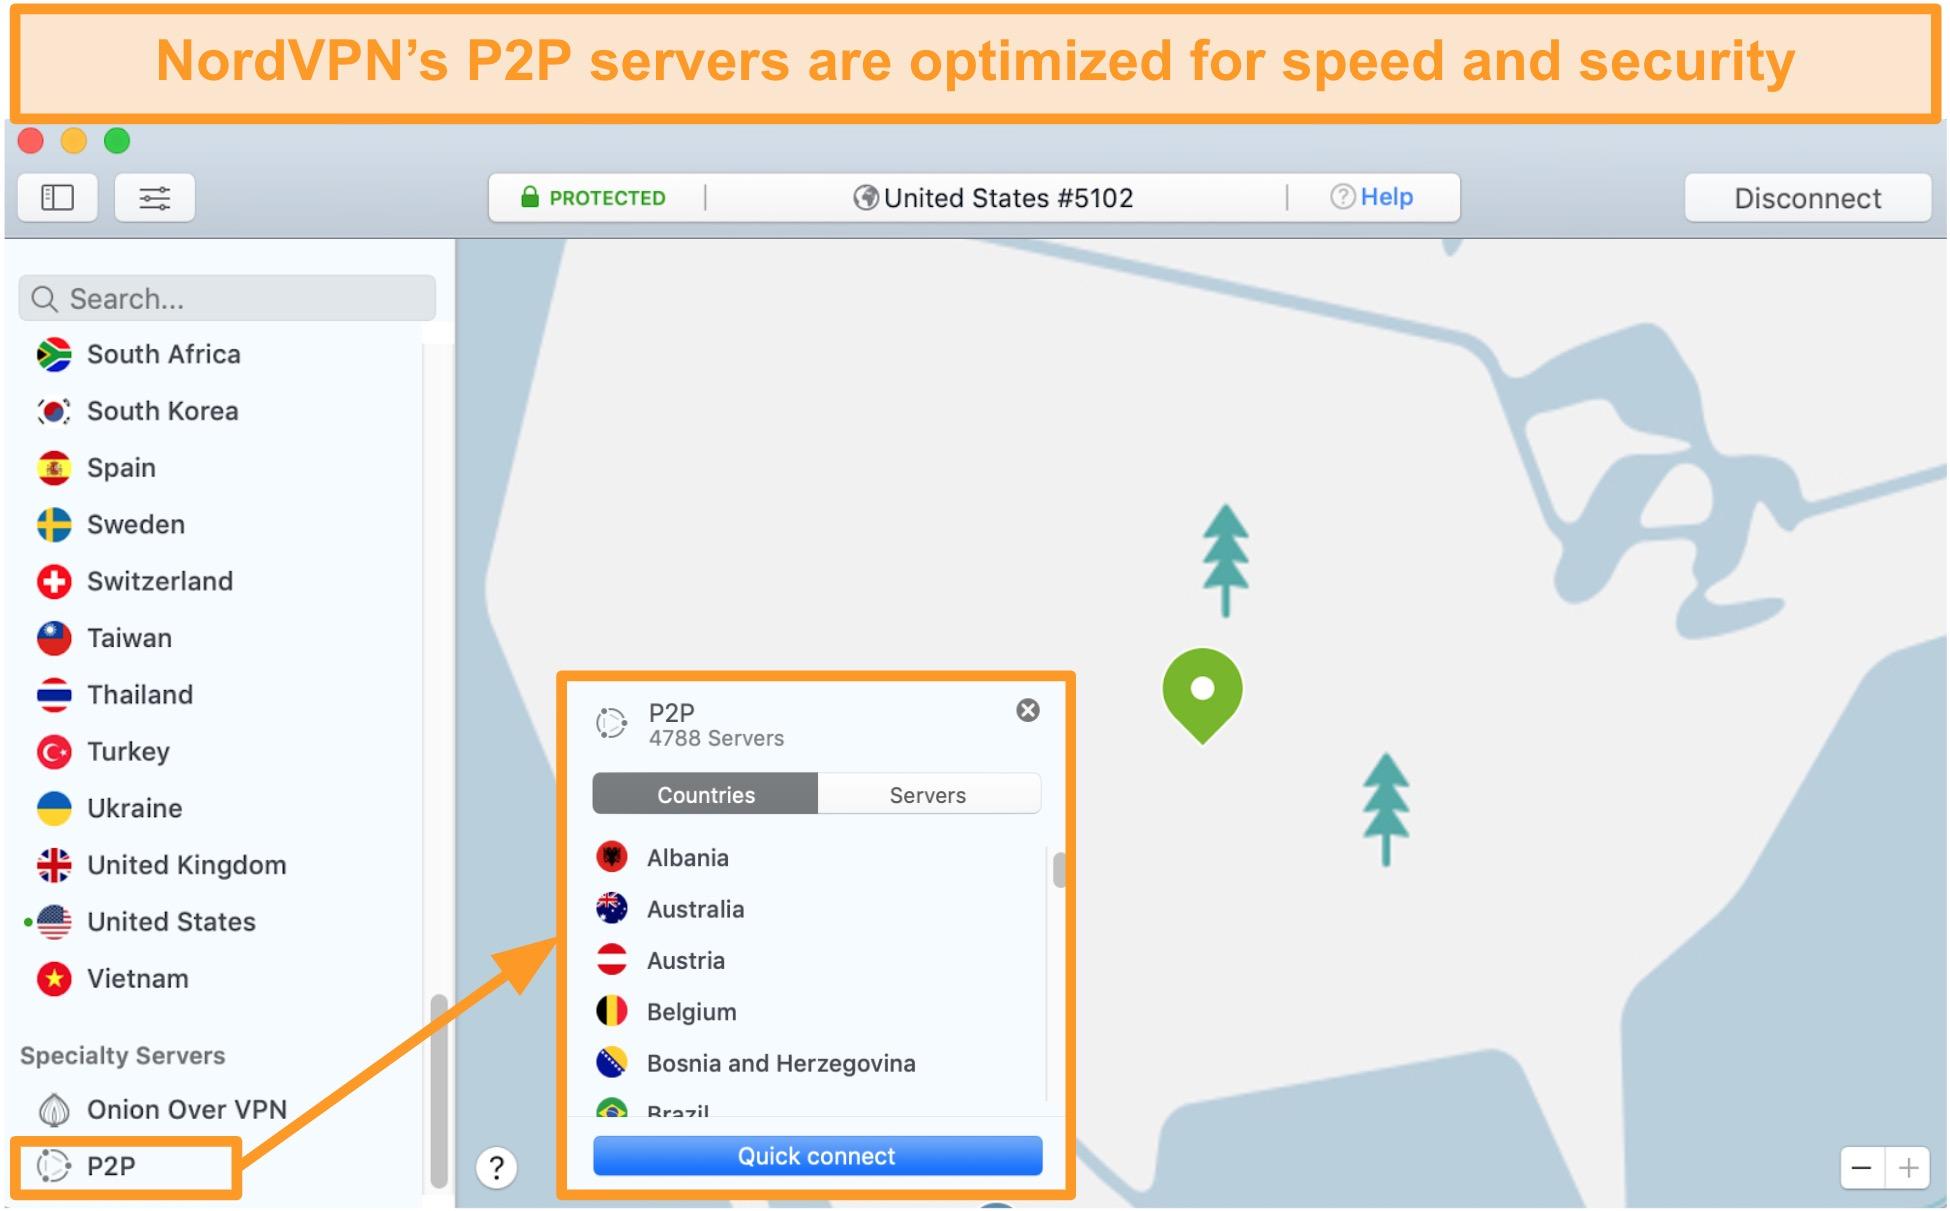 Screenshot of NordVPN's P2P servers on the Mac app